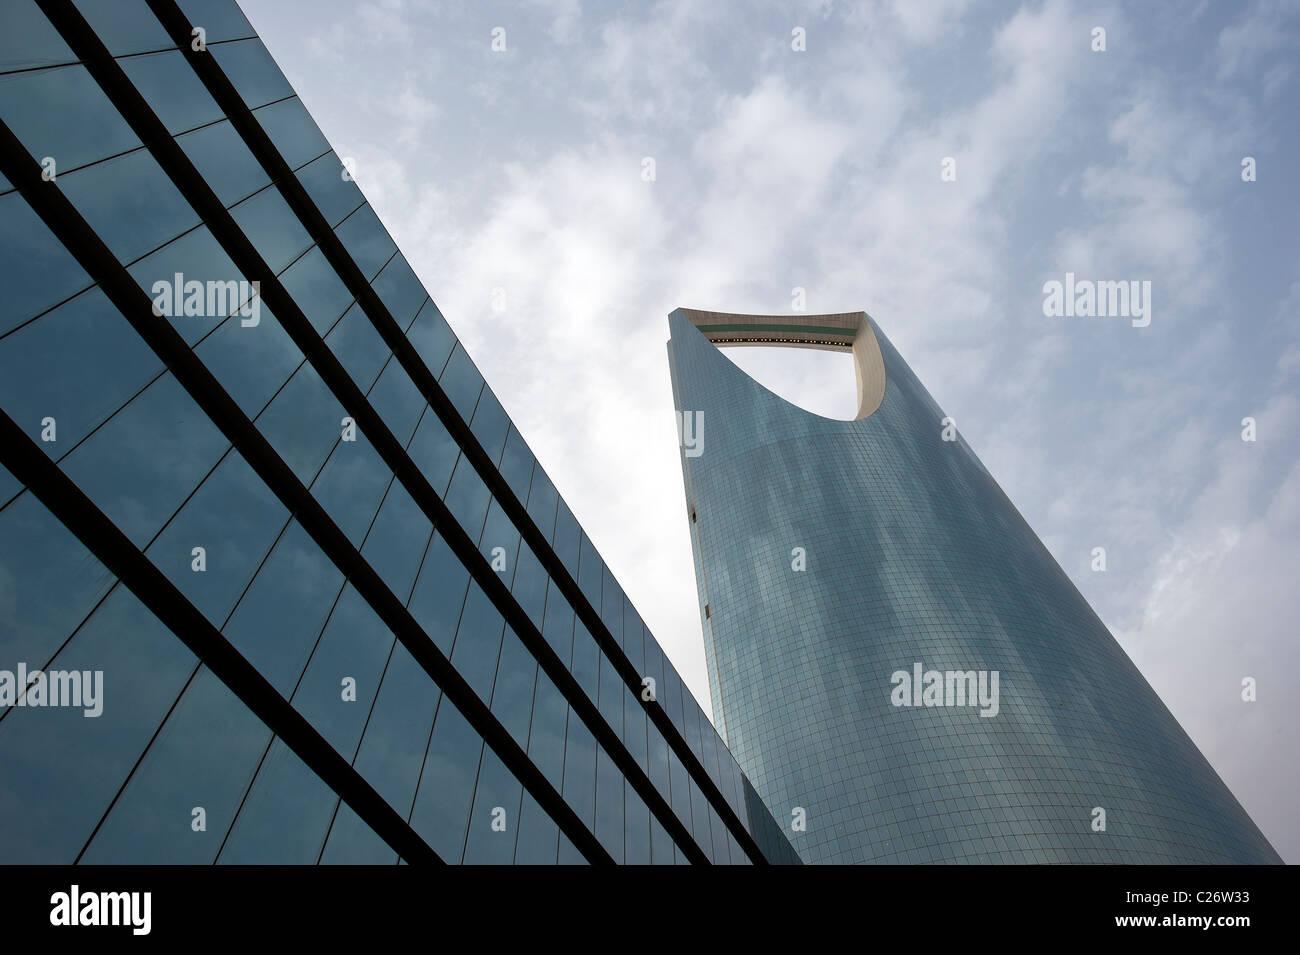 Torre del reino, en Riad, Arabia Saudita Imagen De Stock